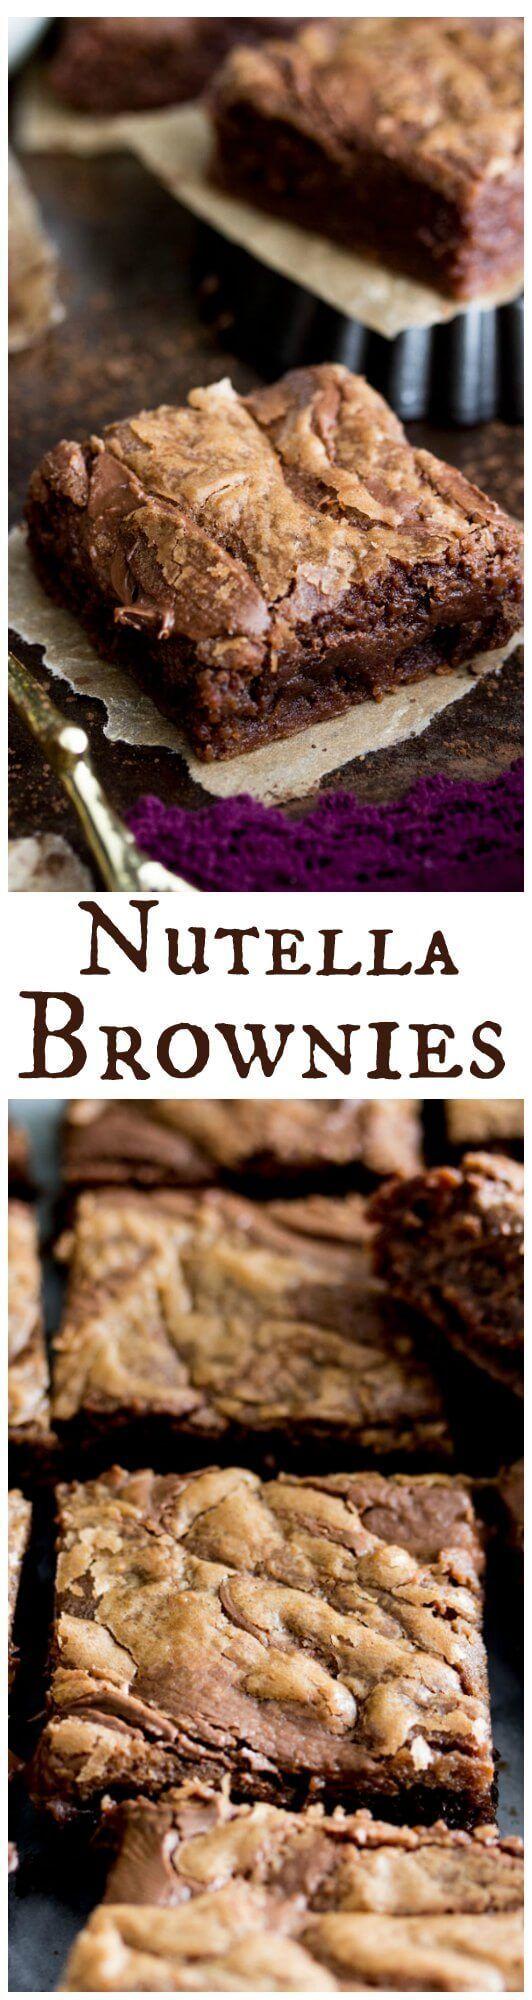 Nutella Topped Brownies Best 25 Brownies Uk Ideas Only On Pinterest Fudge Recipe Uk